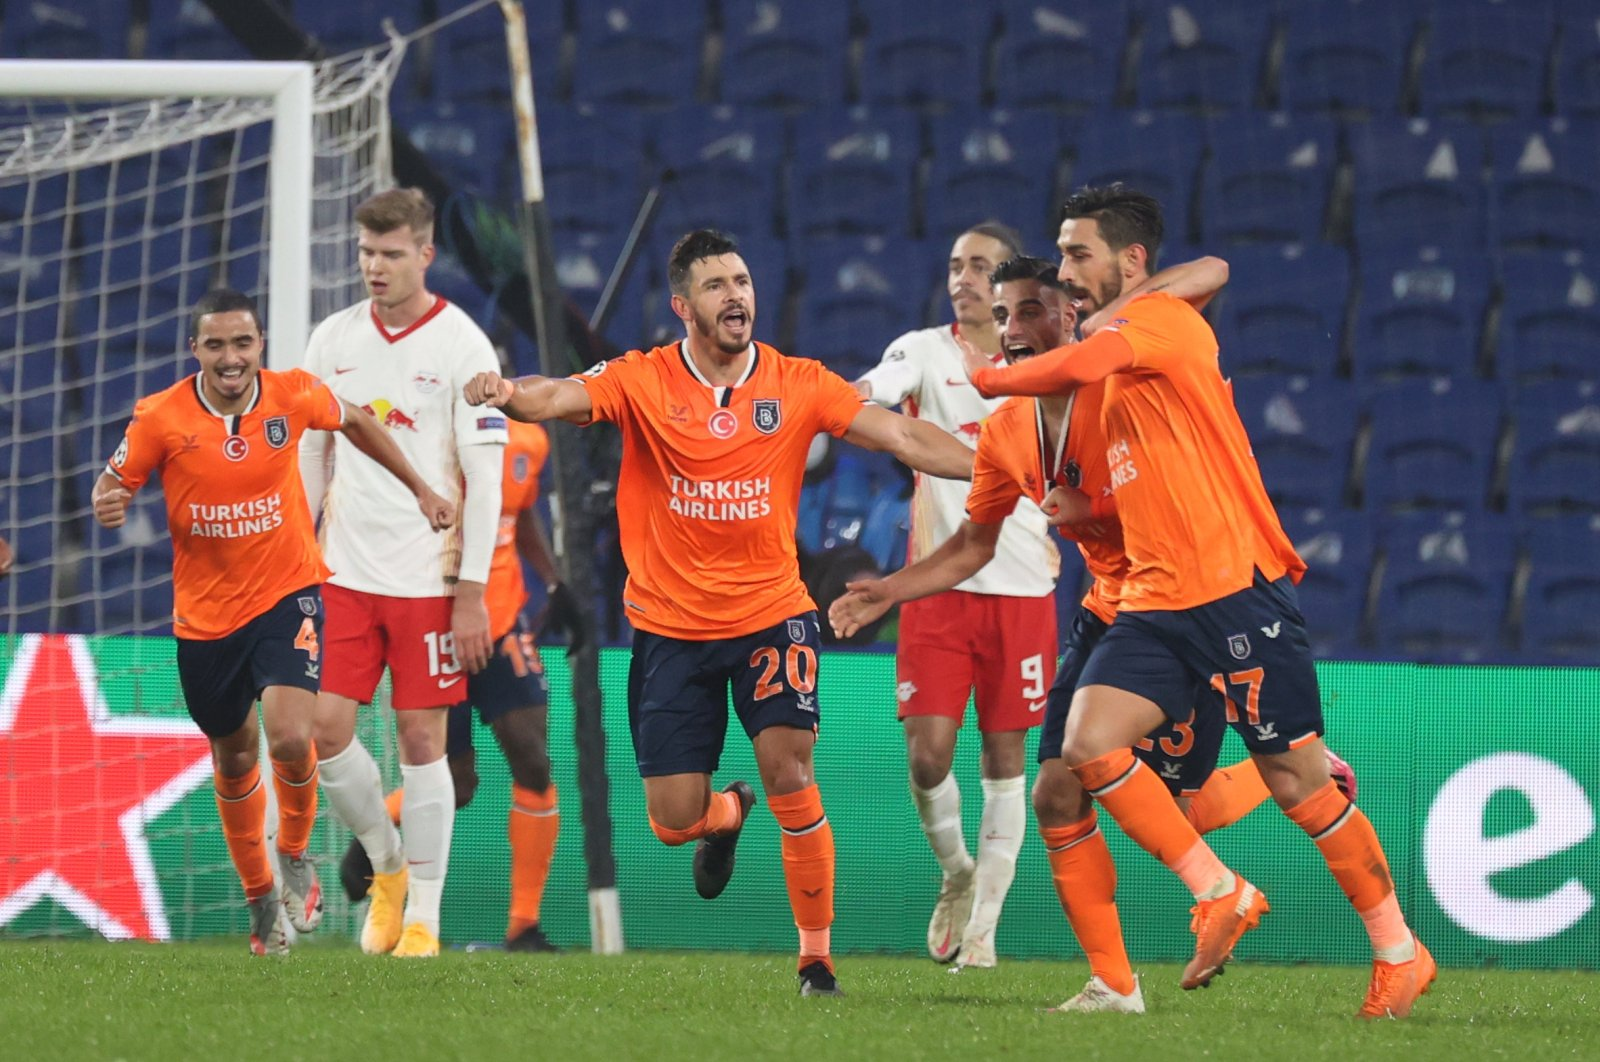 Irfan Can Kahveci (L) celebrates a goal against Leipzig with teammates, in Istanbul, Turkey, Dec. 2, 2020. (AA Photo)